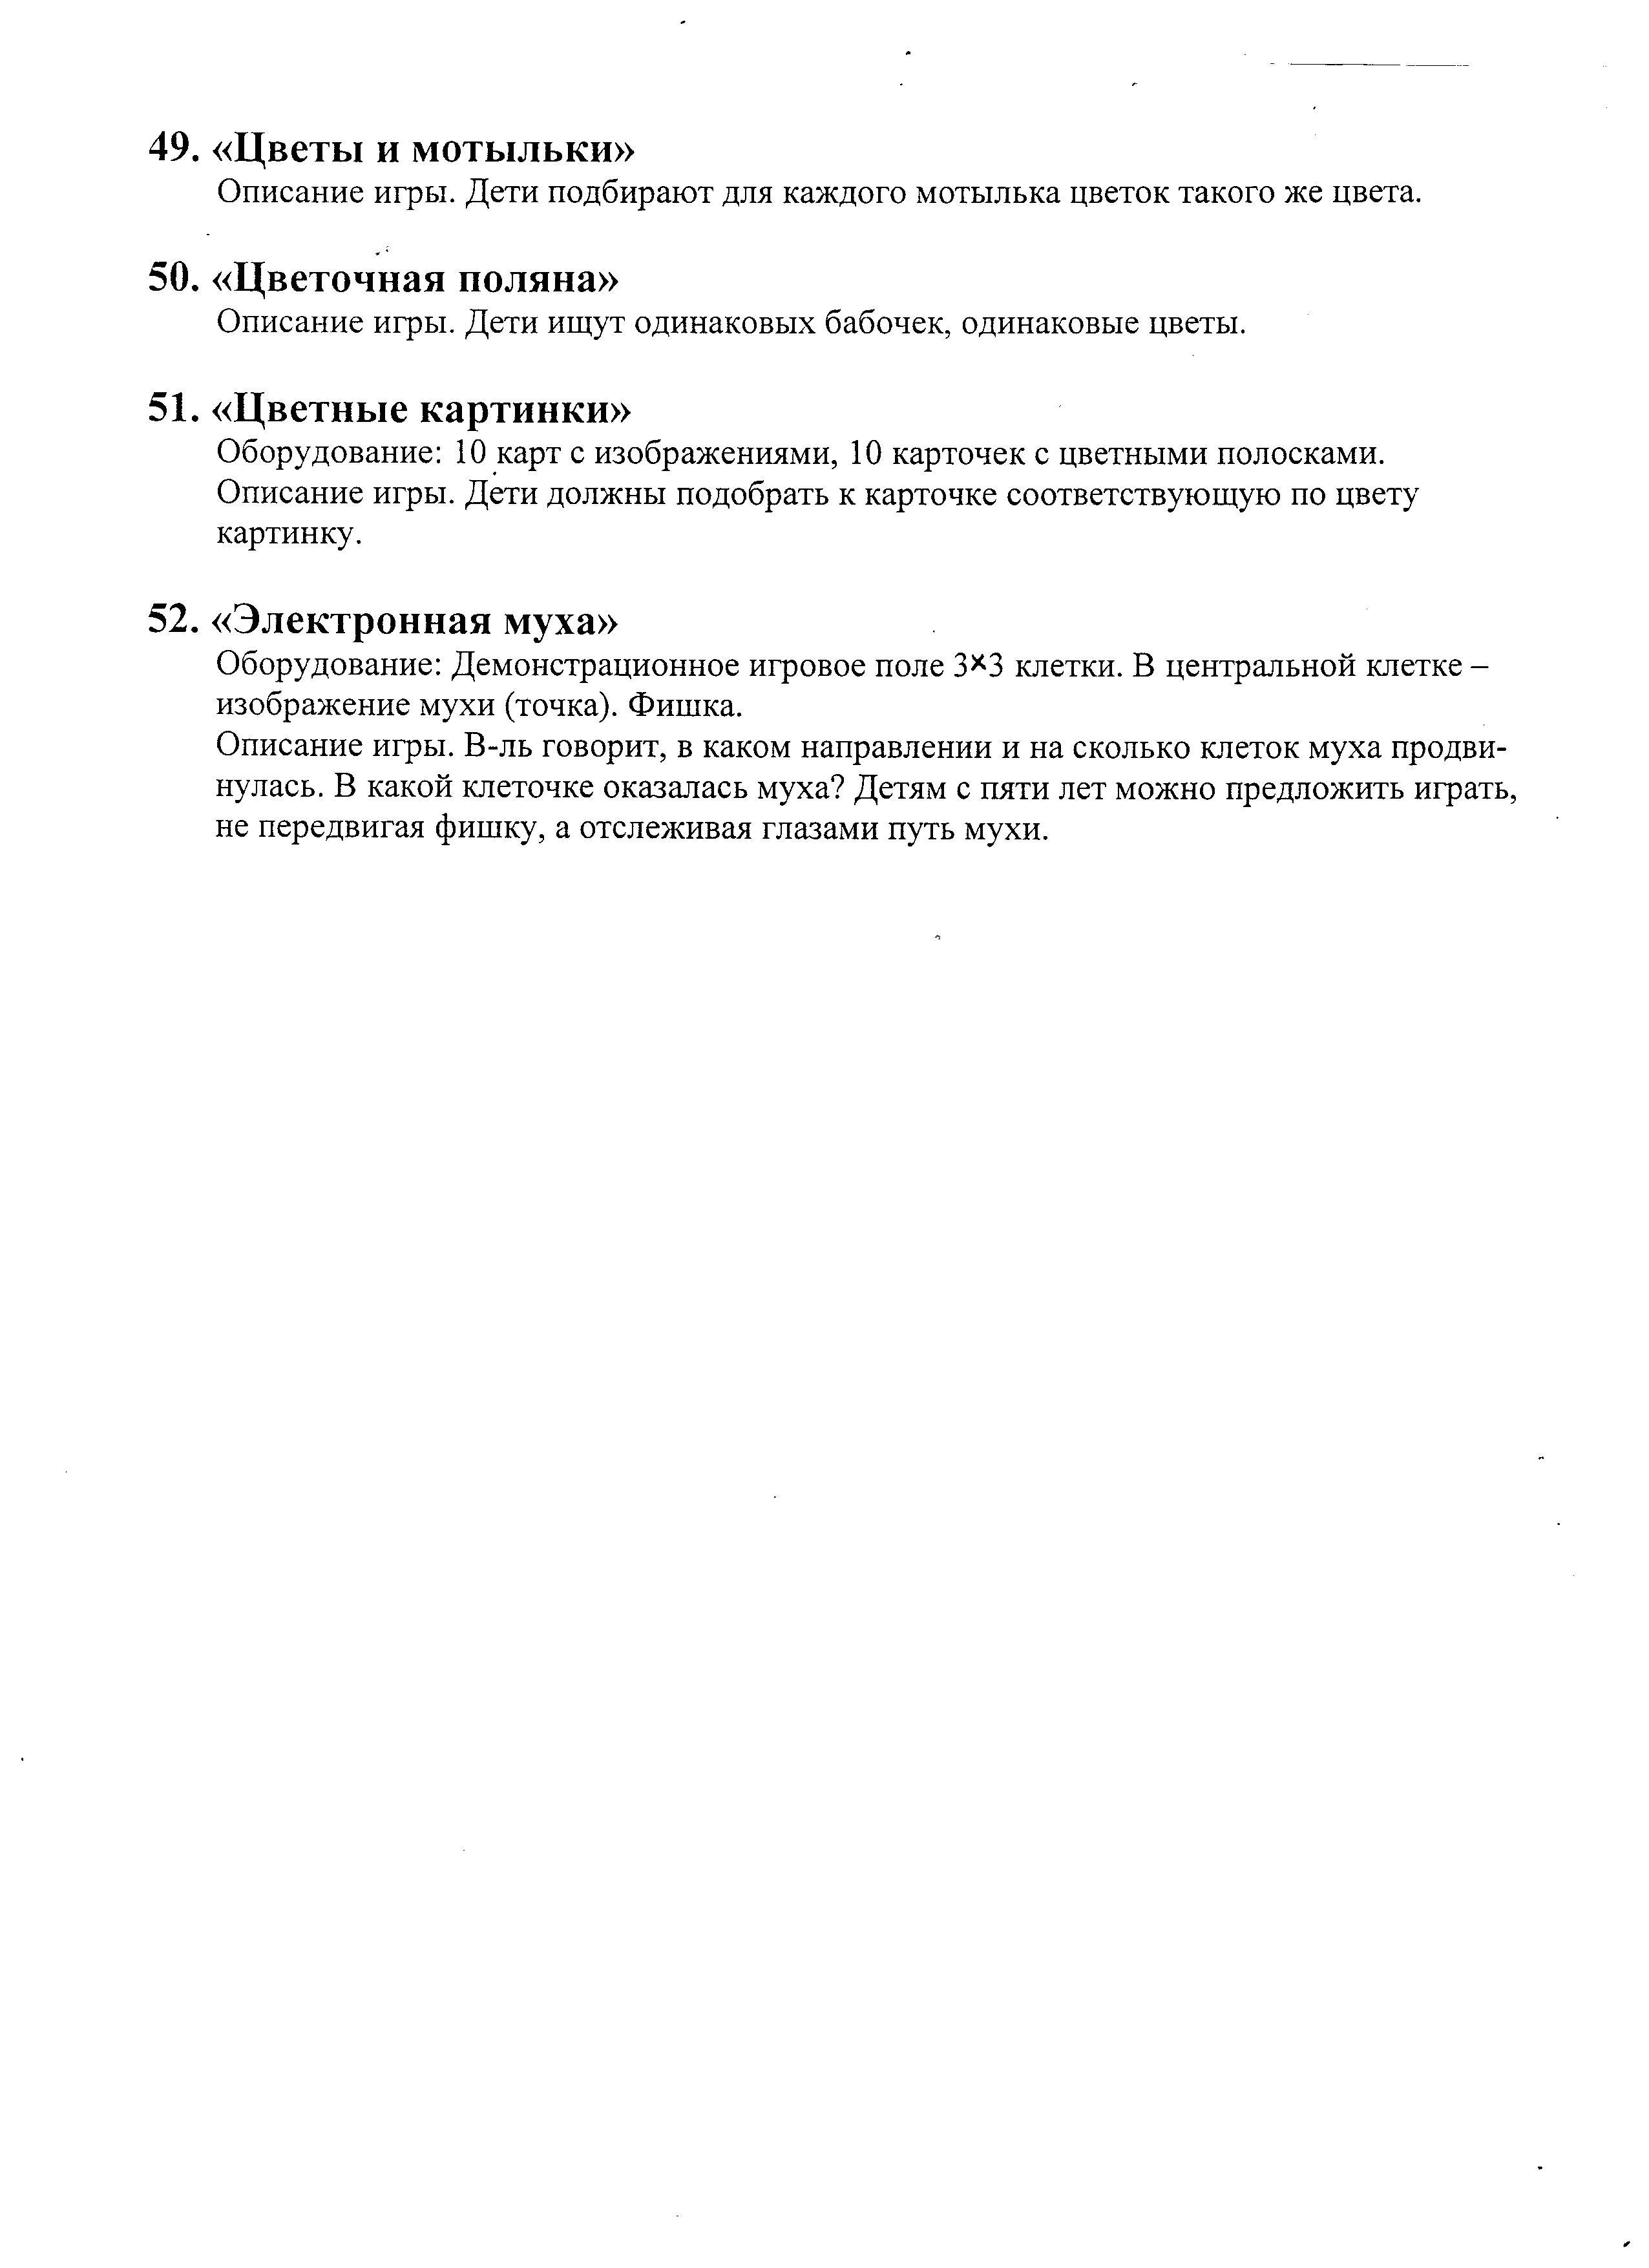 hello_html_13c99c65.jpg